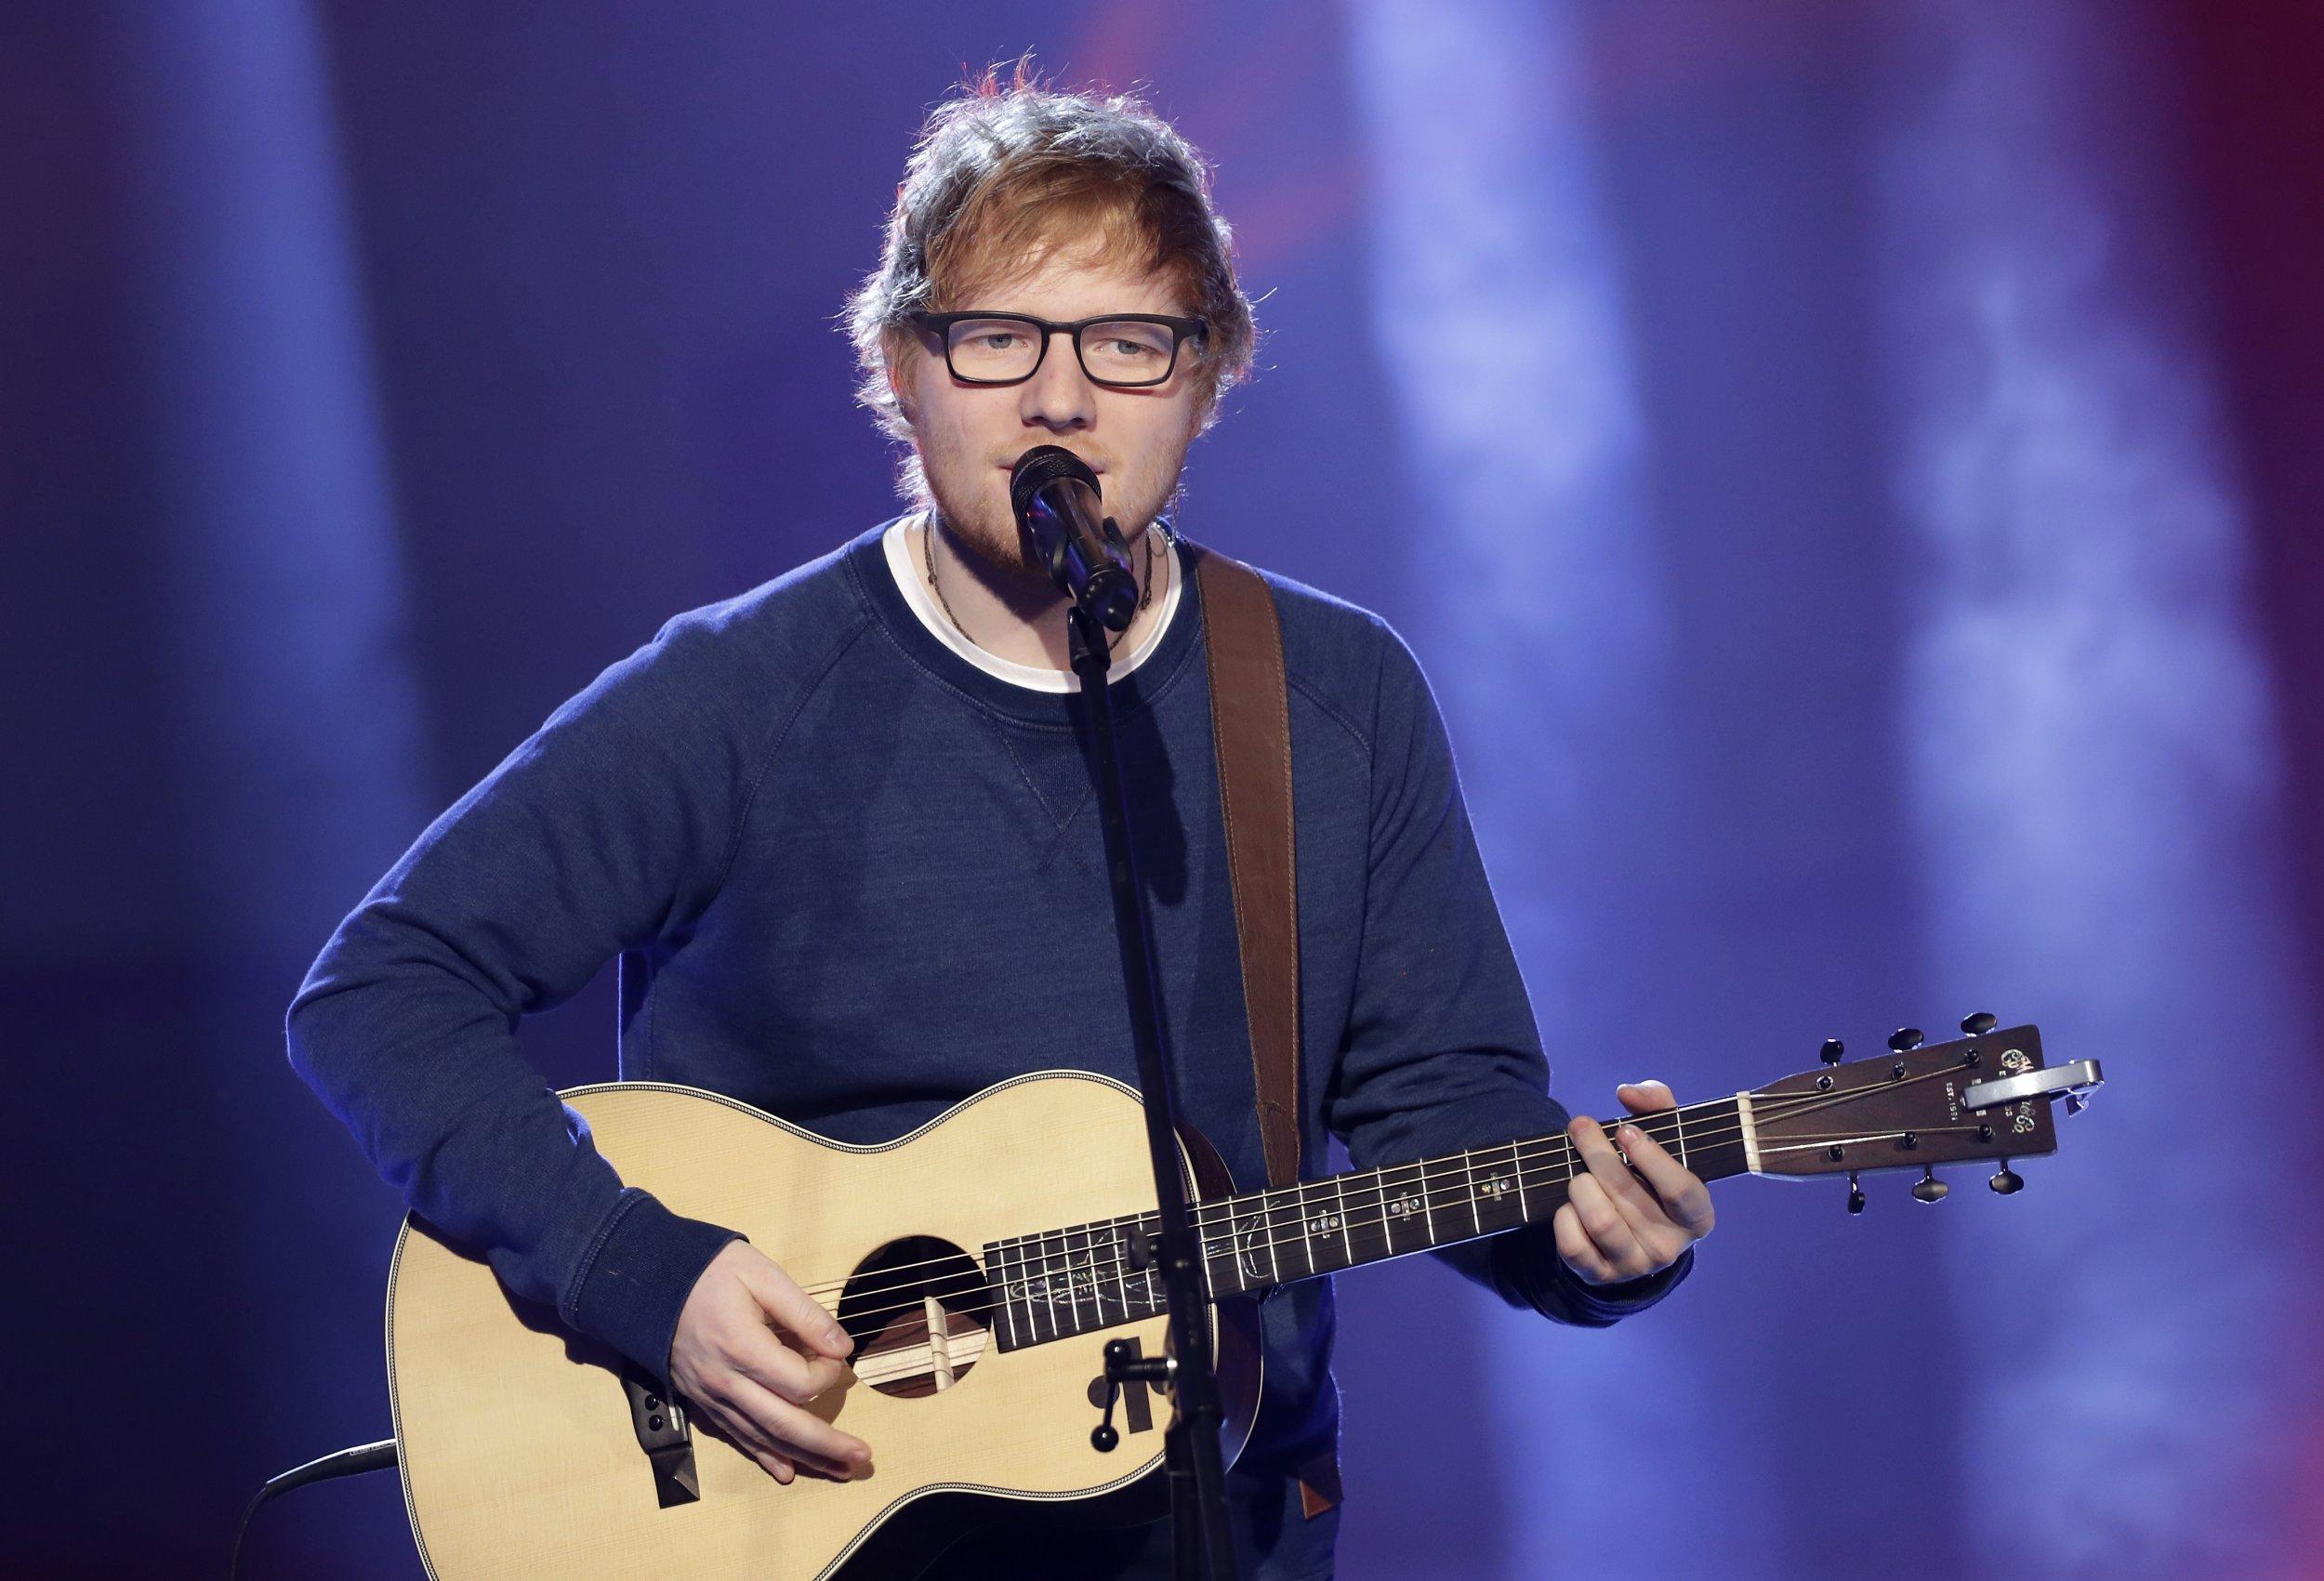 Stand down – Ed Sheeran isn't married despite wearing 'wedding ring'